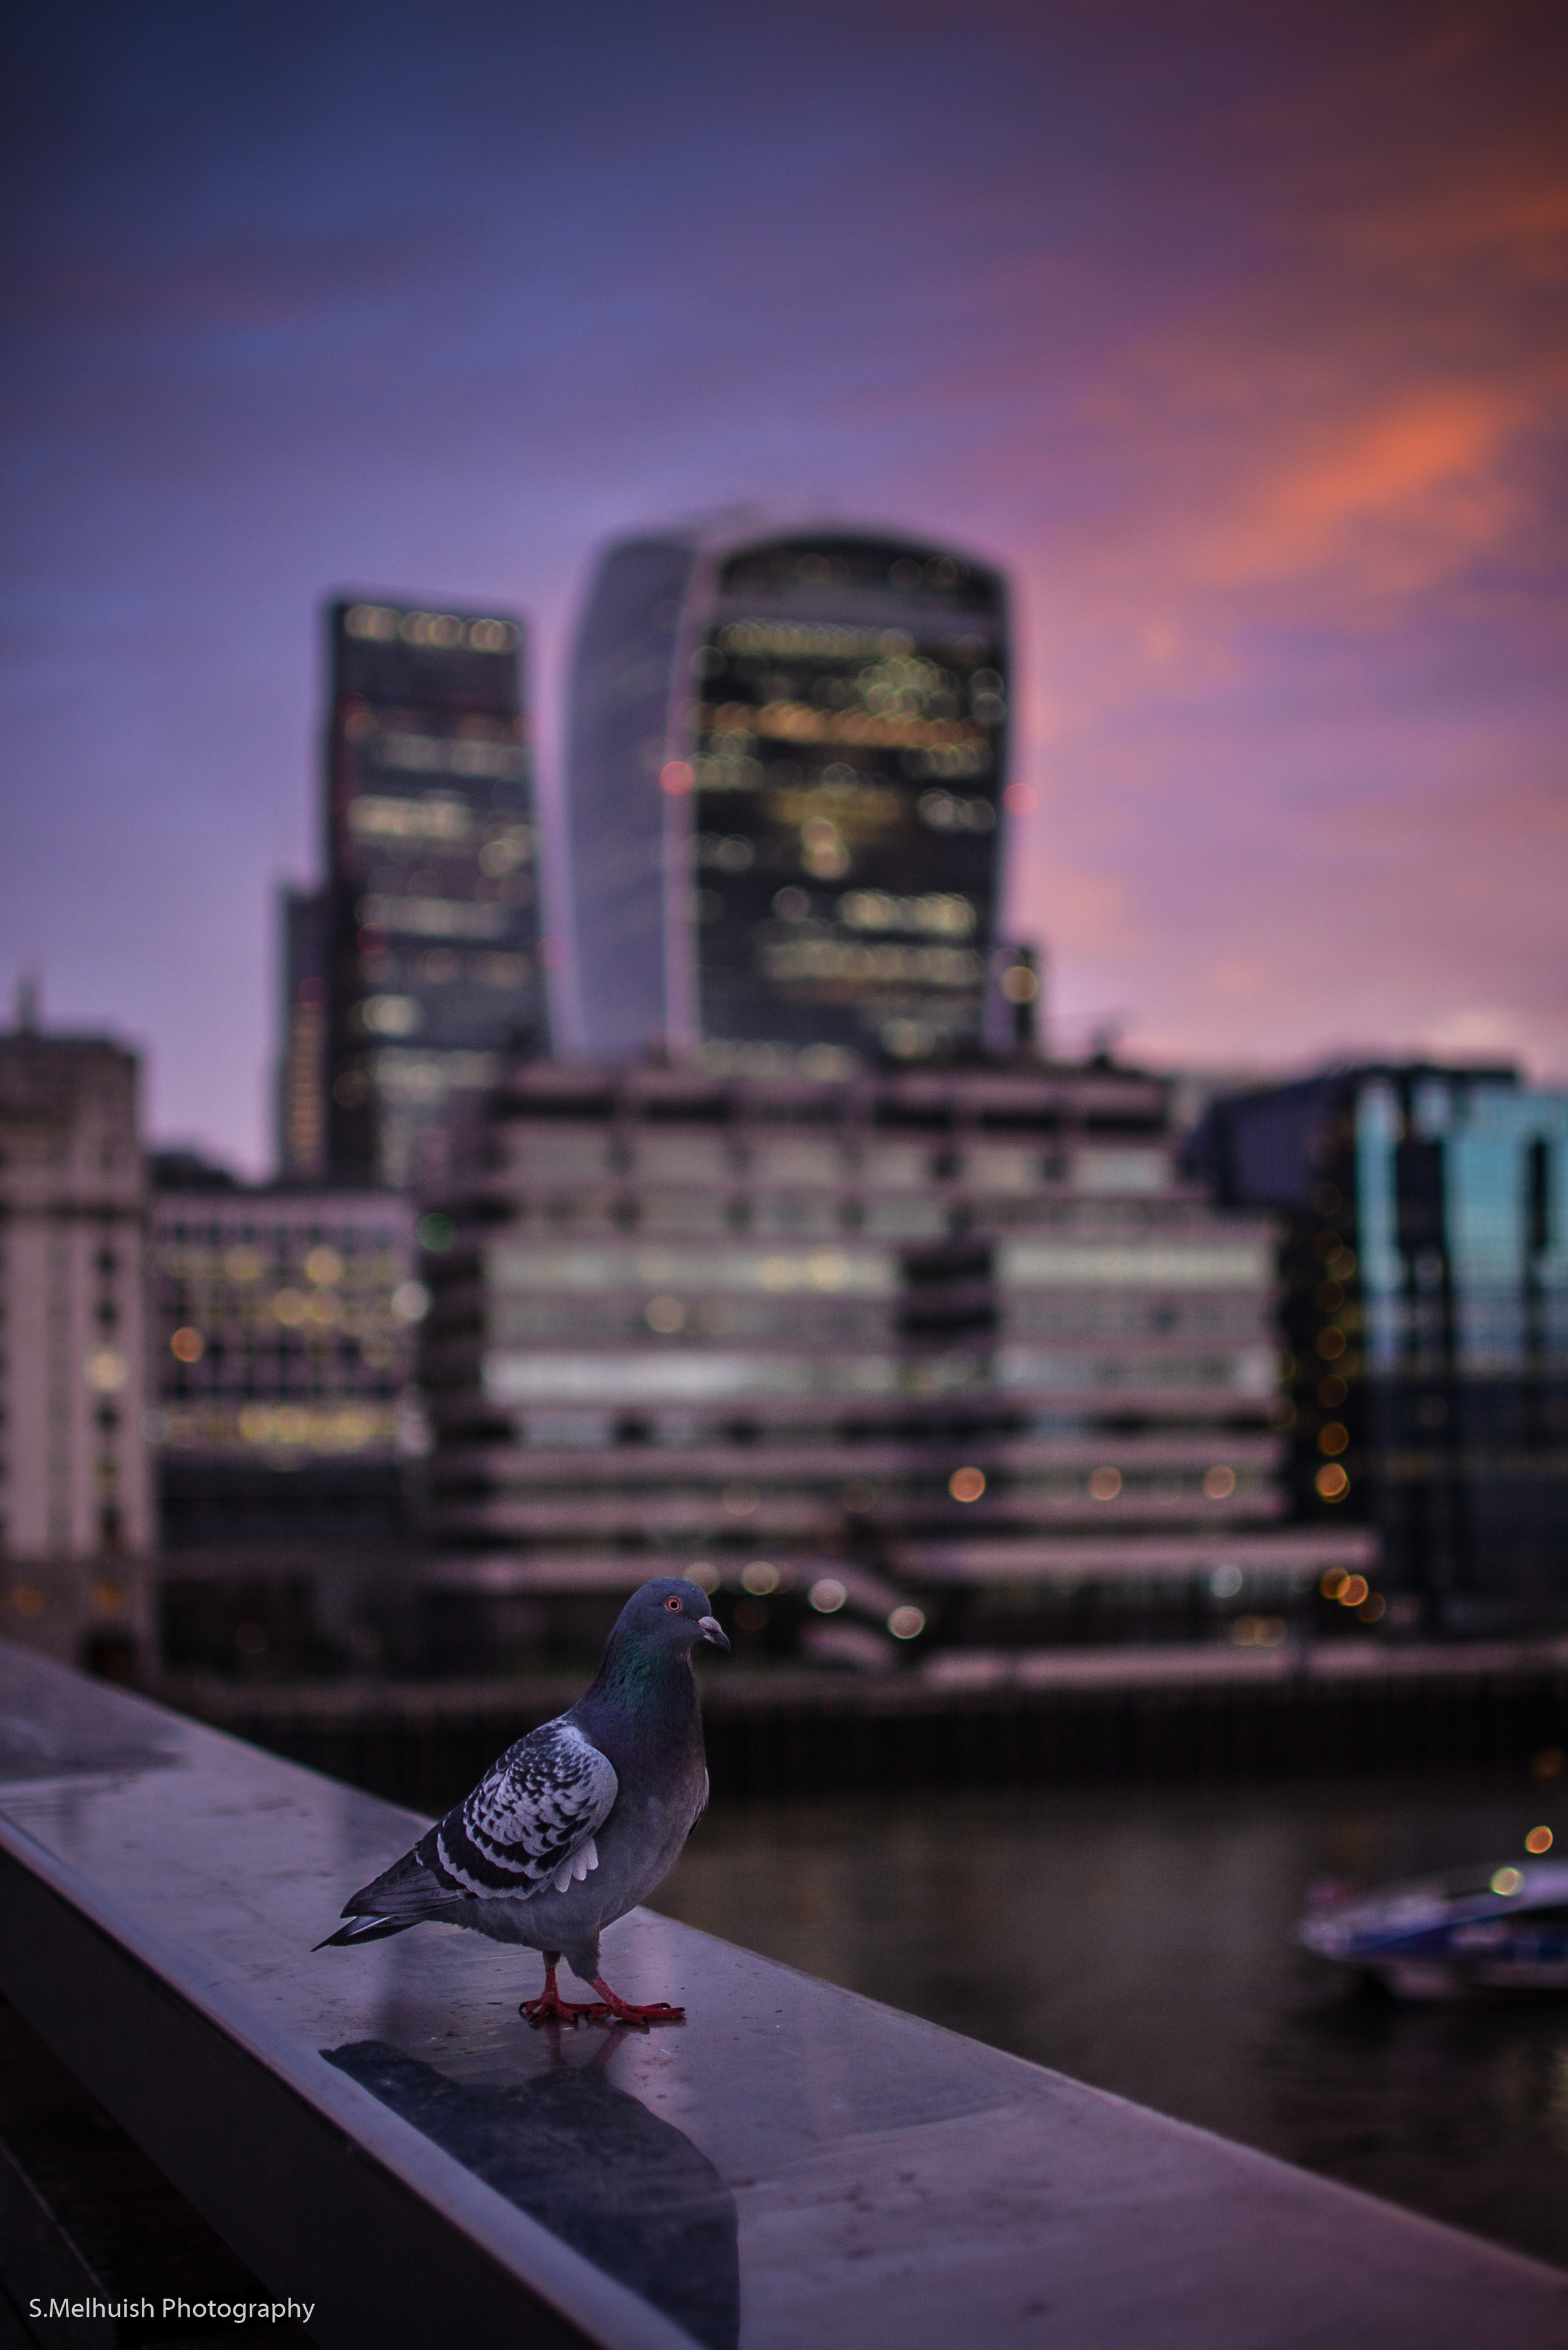 photobombed at London Bridge